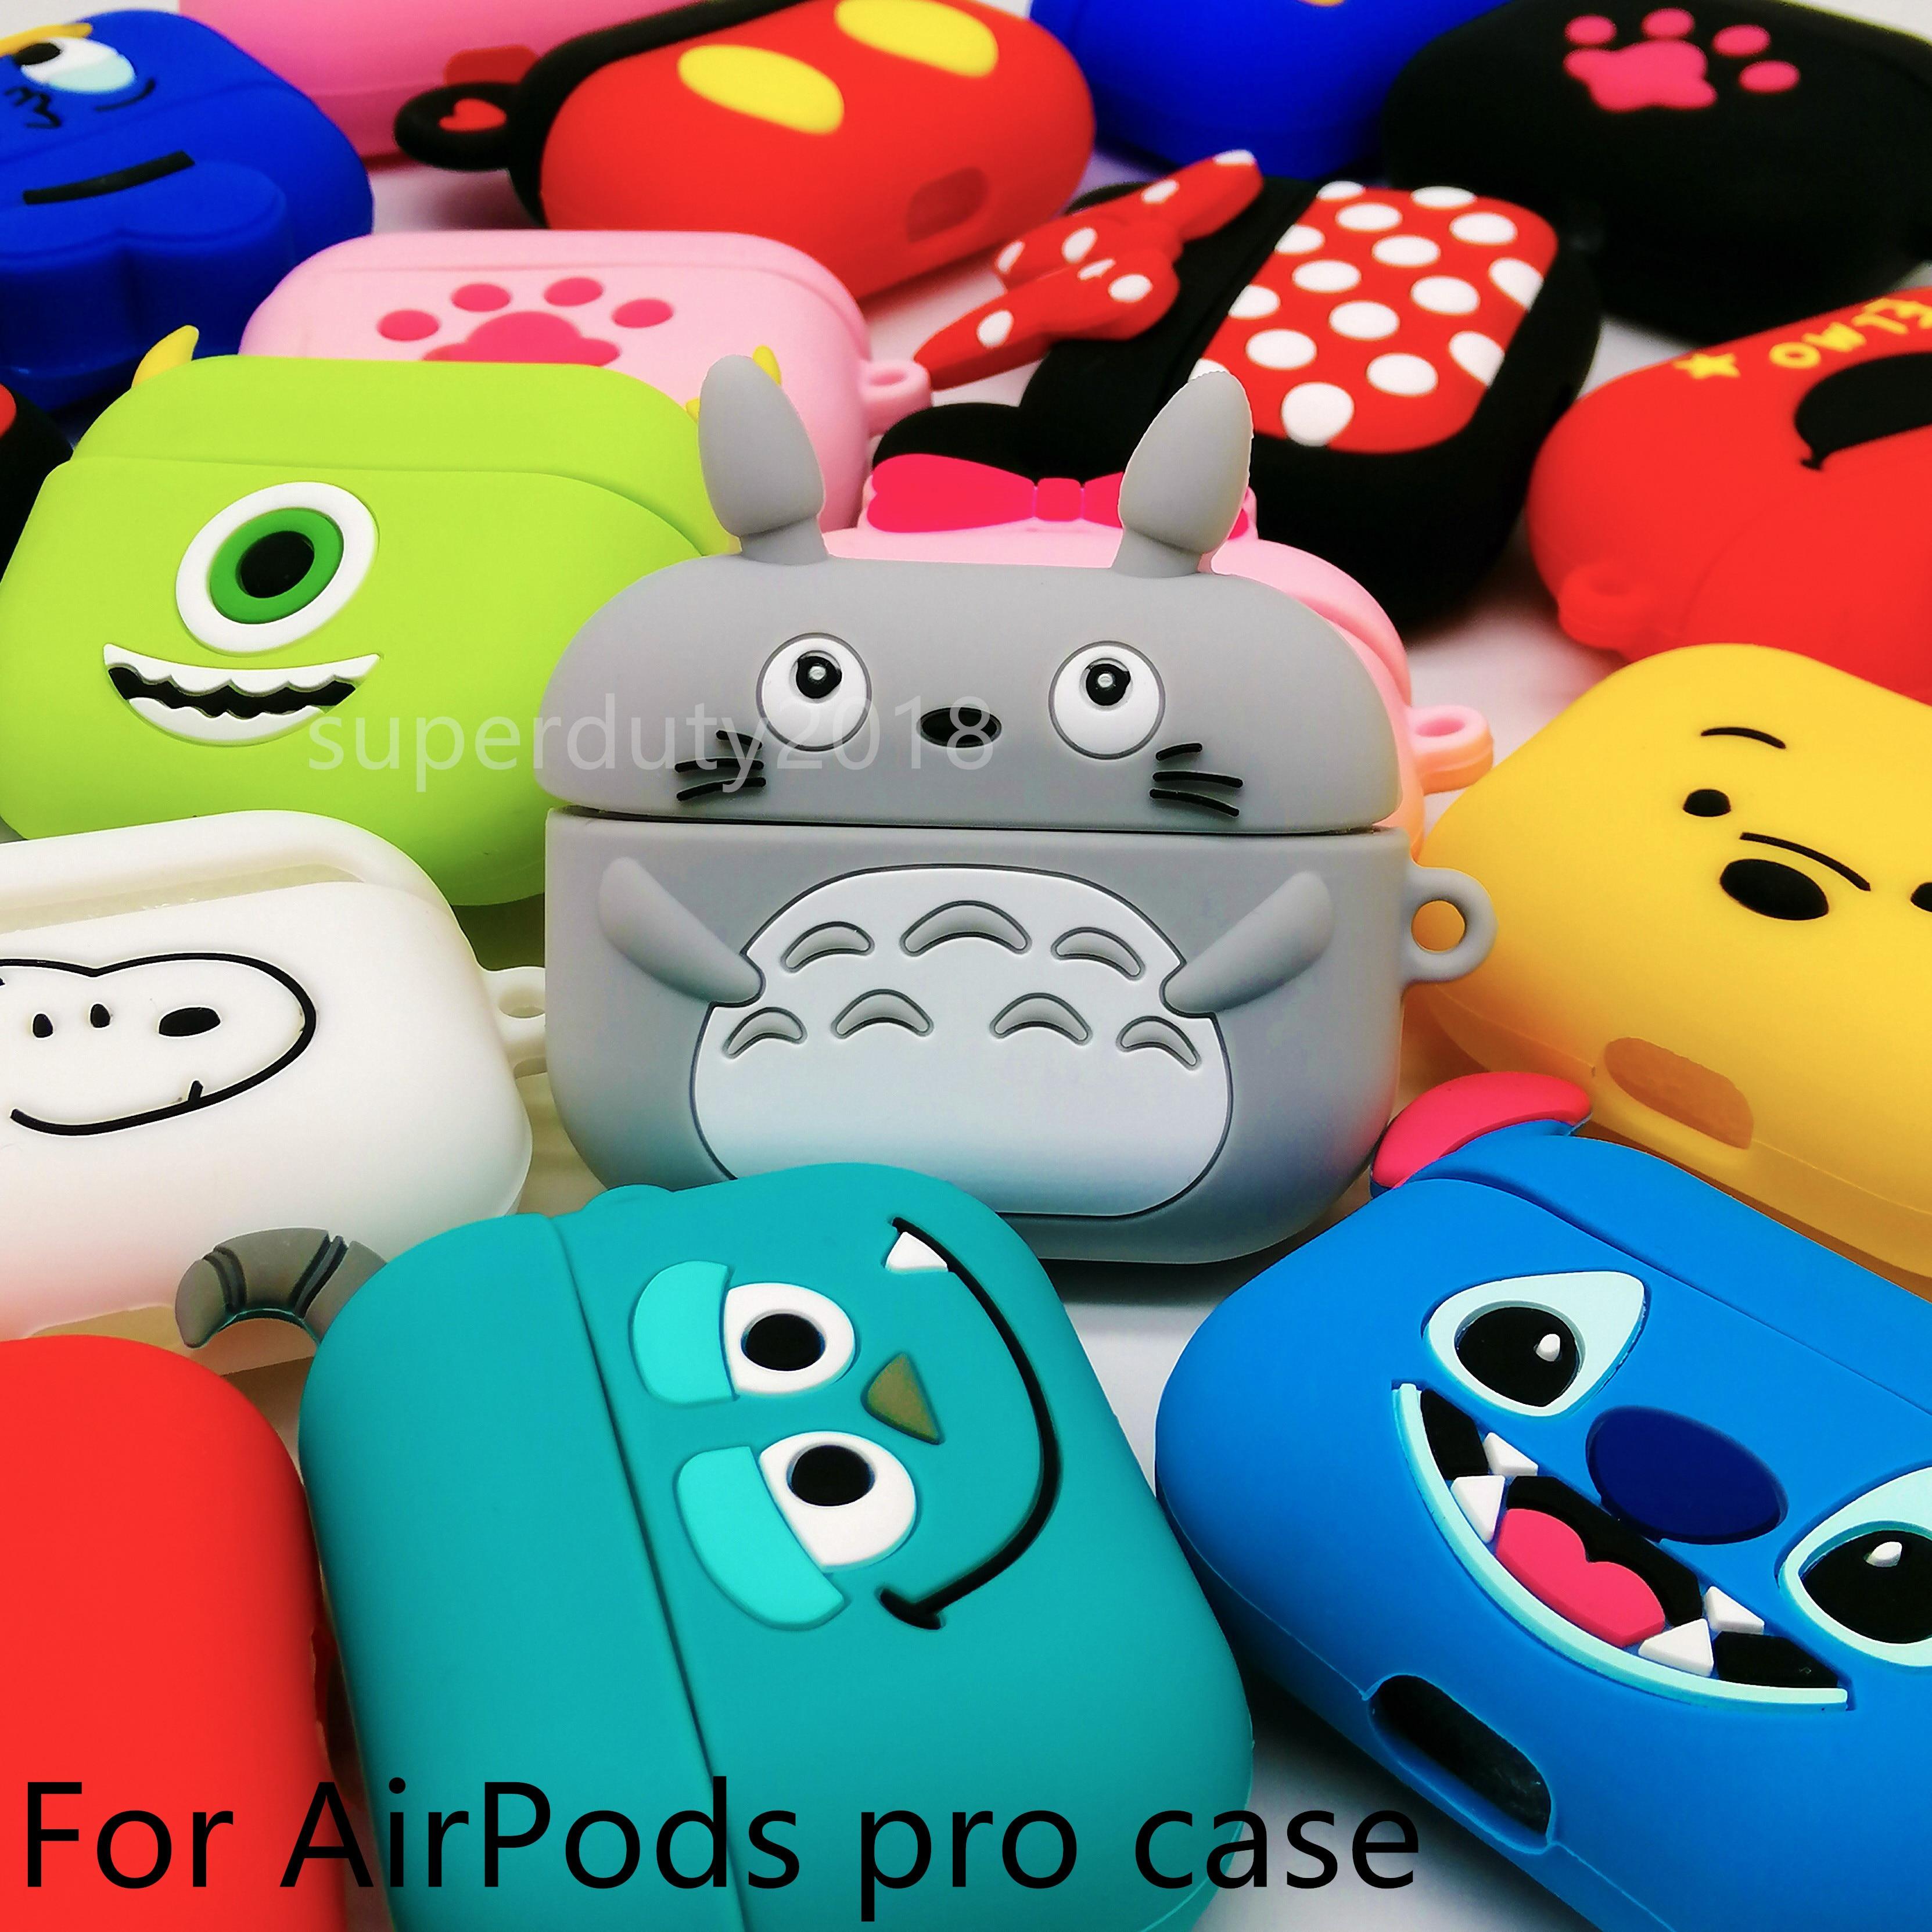 Cartoon Cute Case For Airpods Pro Case Wireless For Airpods Pro 3 Case Cover For AirPods Pro Silicone Headphones Case Protective